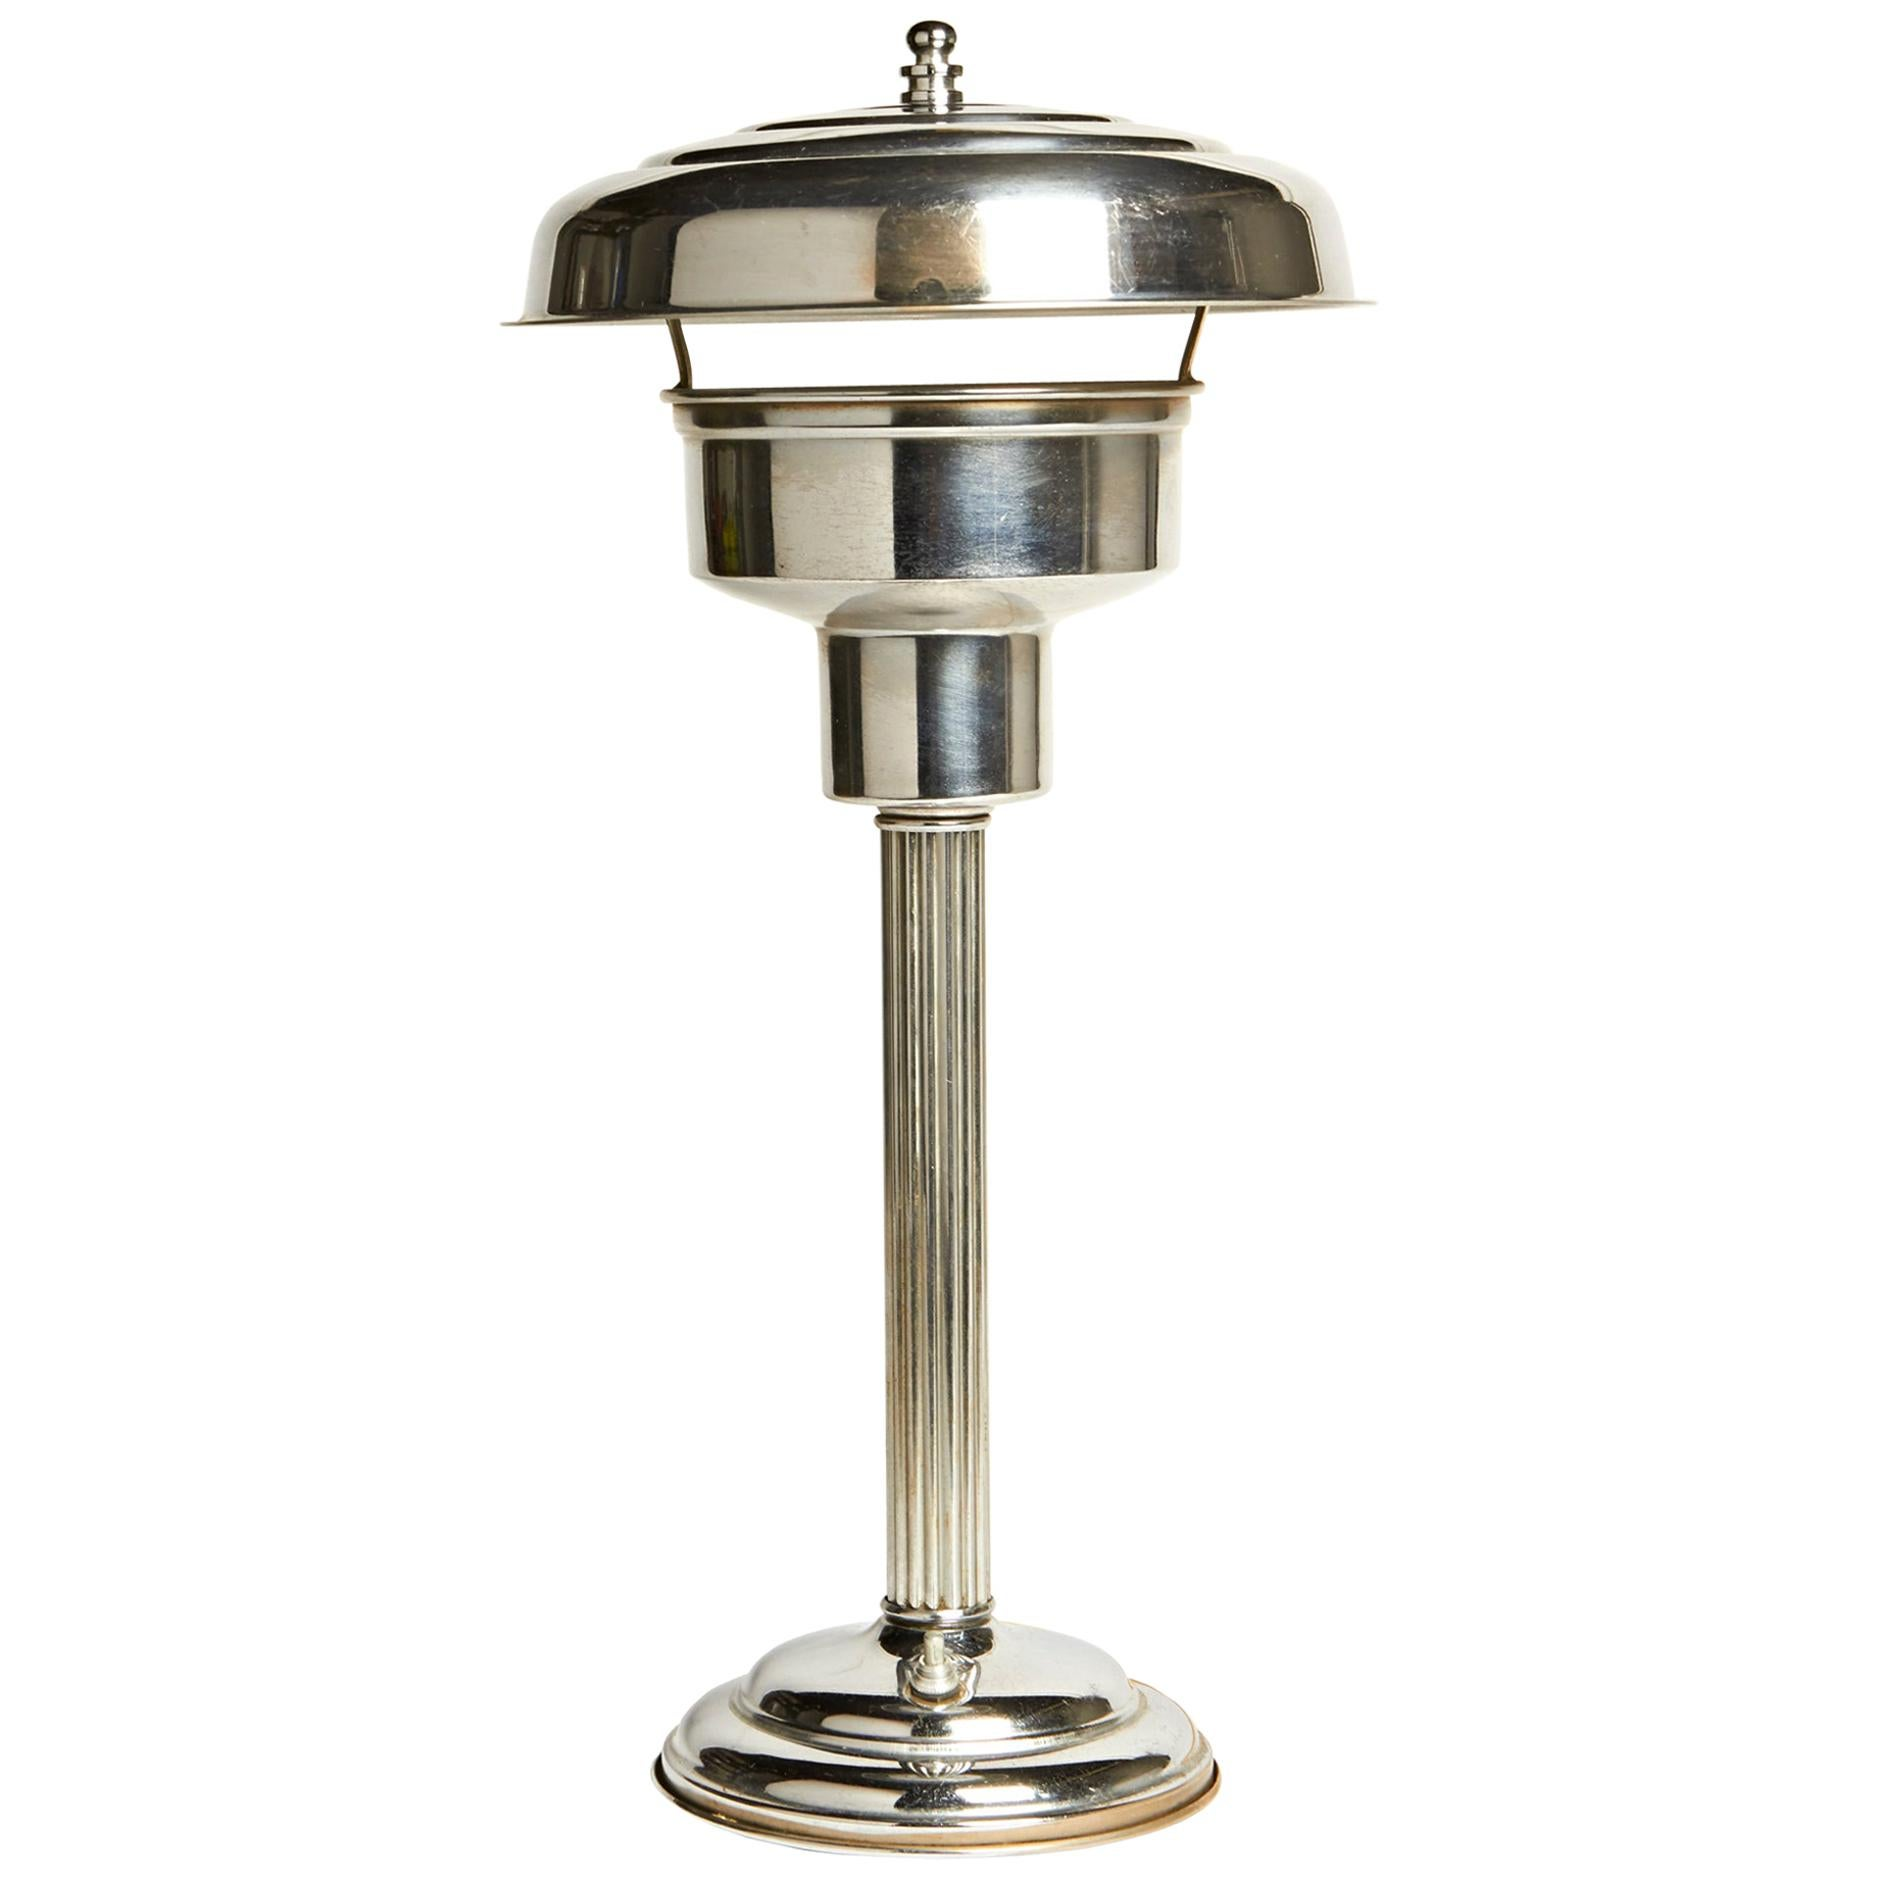 American Art Deco Chrome Tall Table Lamp with Internal Mercury Glass Reflector